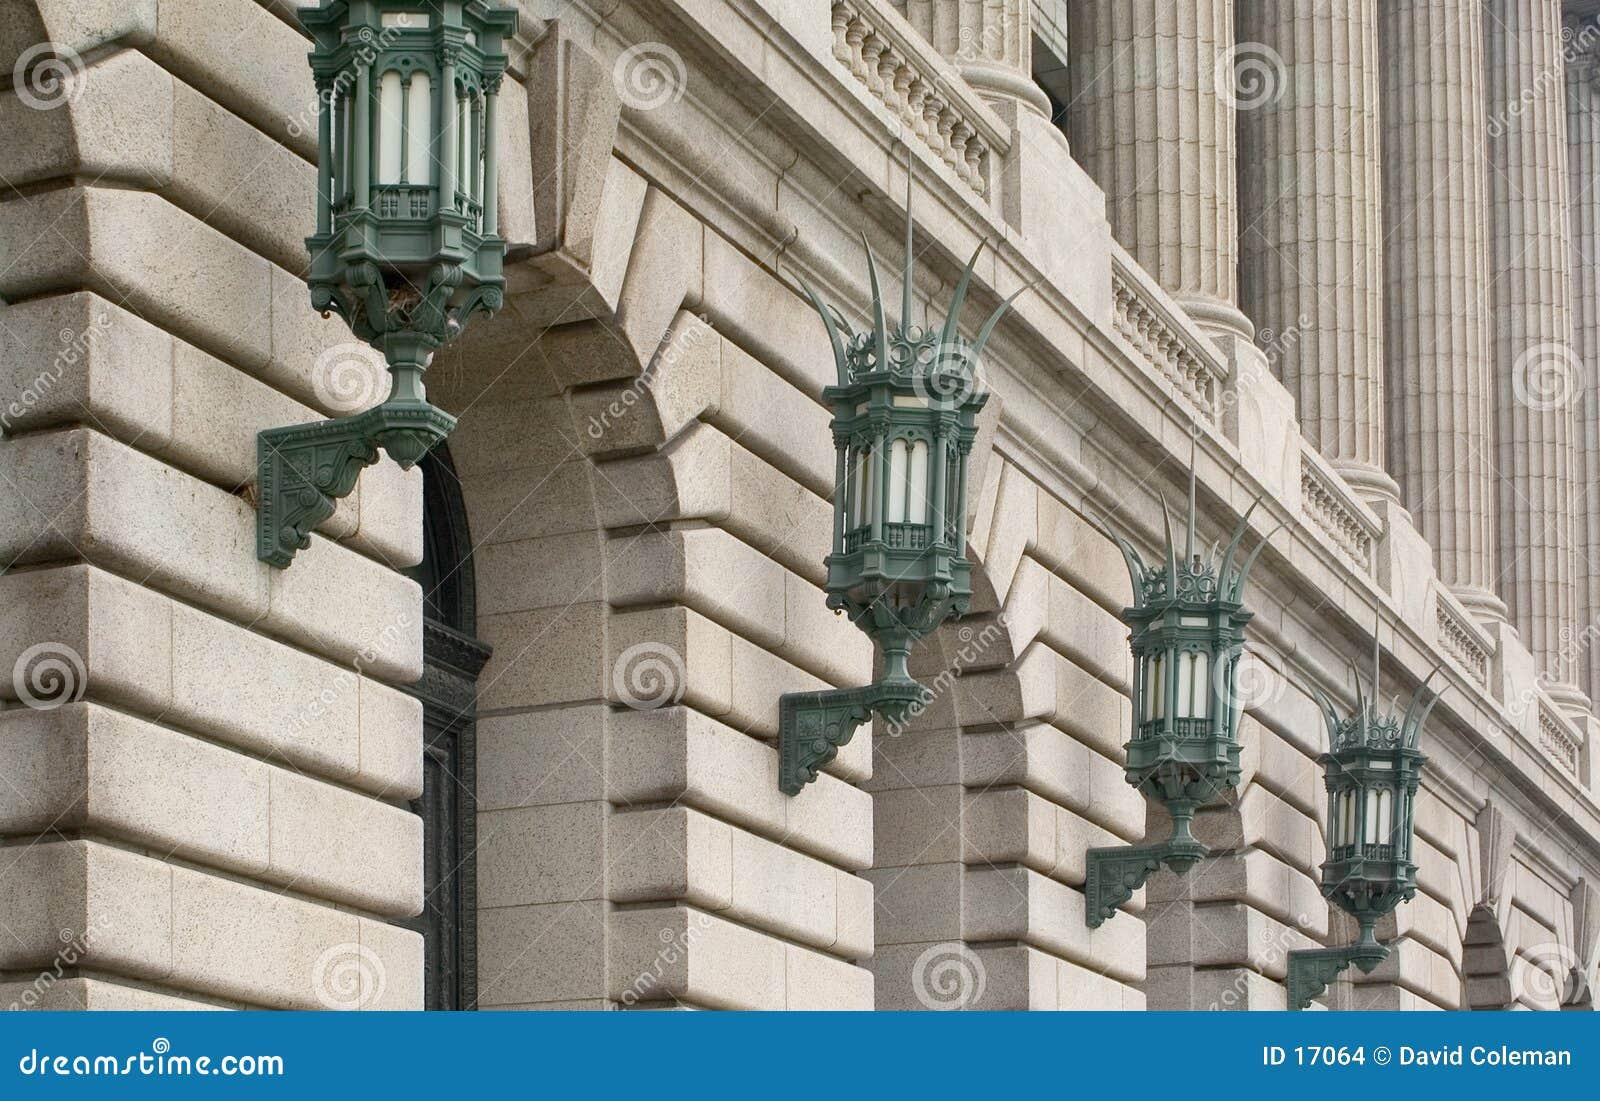 Arkitektonisk lighting